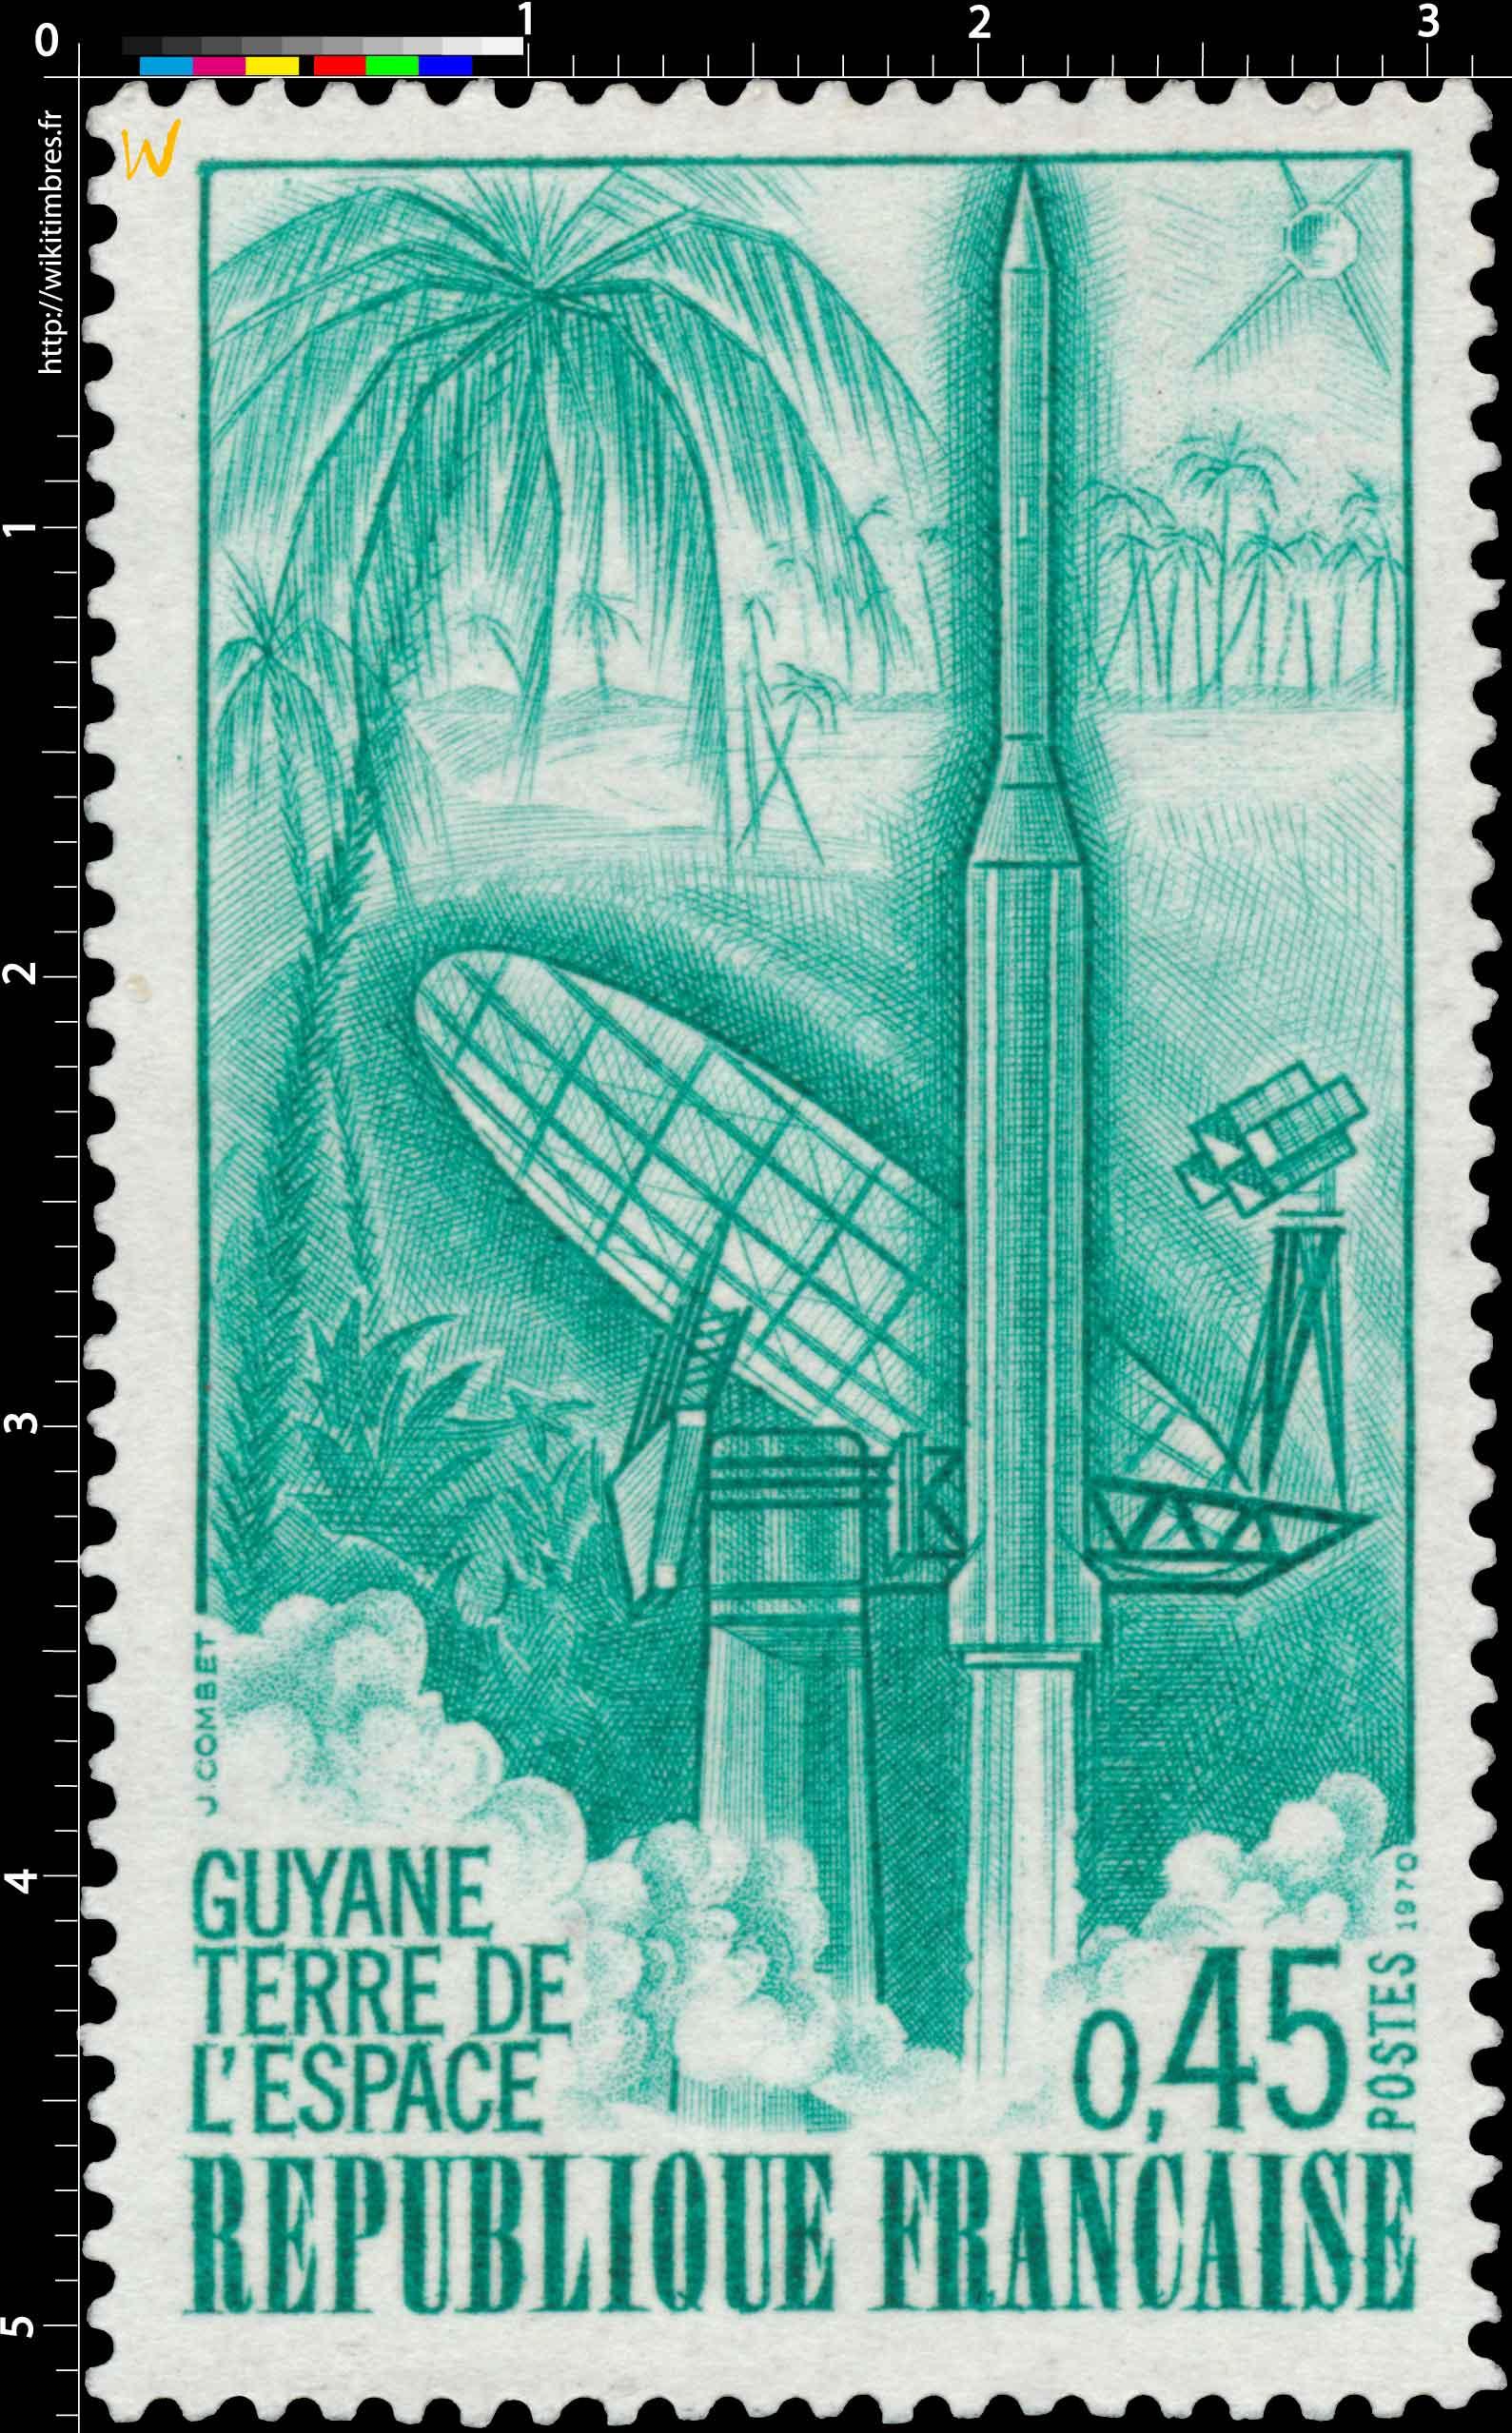 1970 GUYANE TERRE DE L'ESPACE